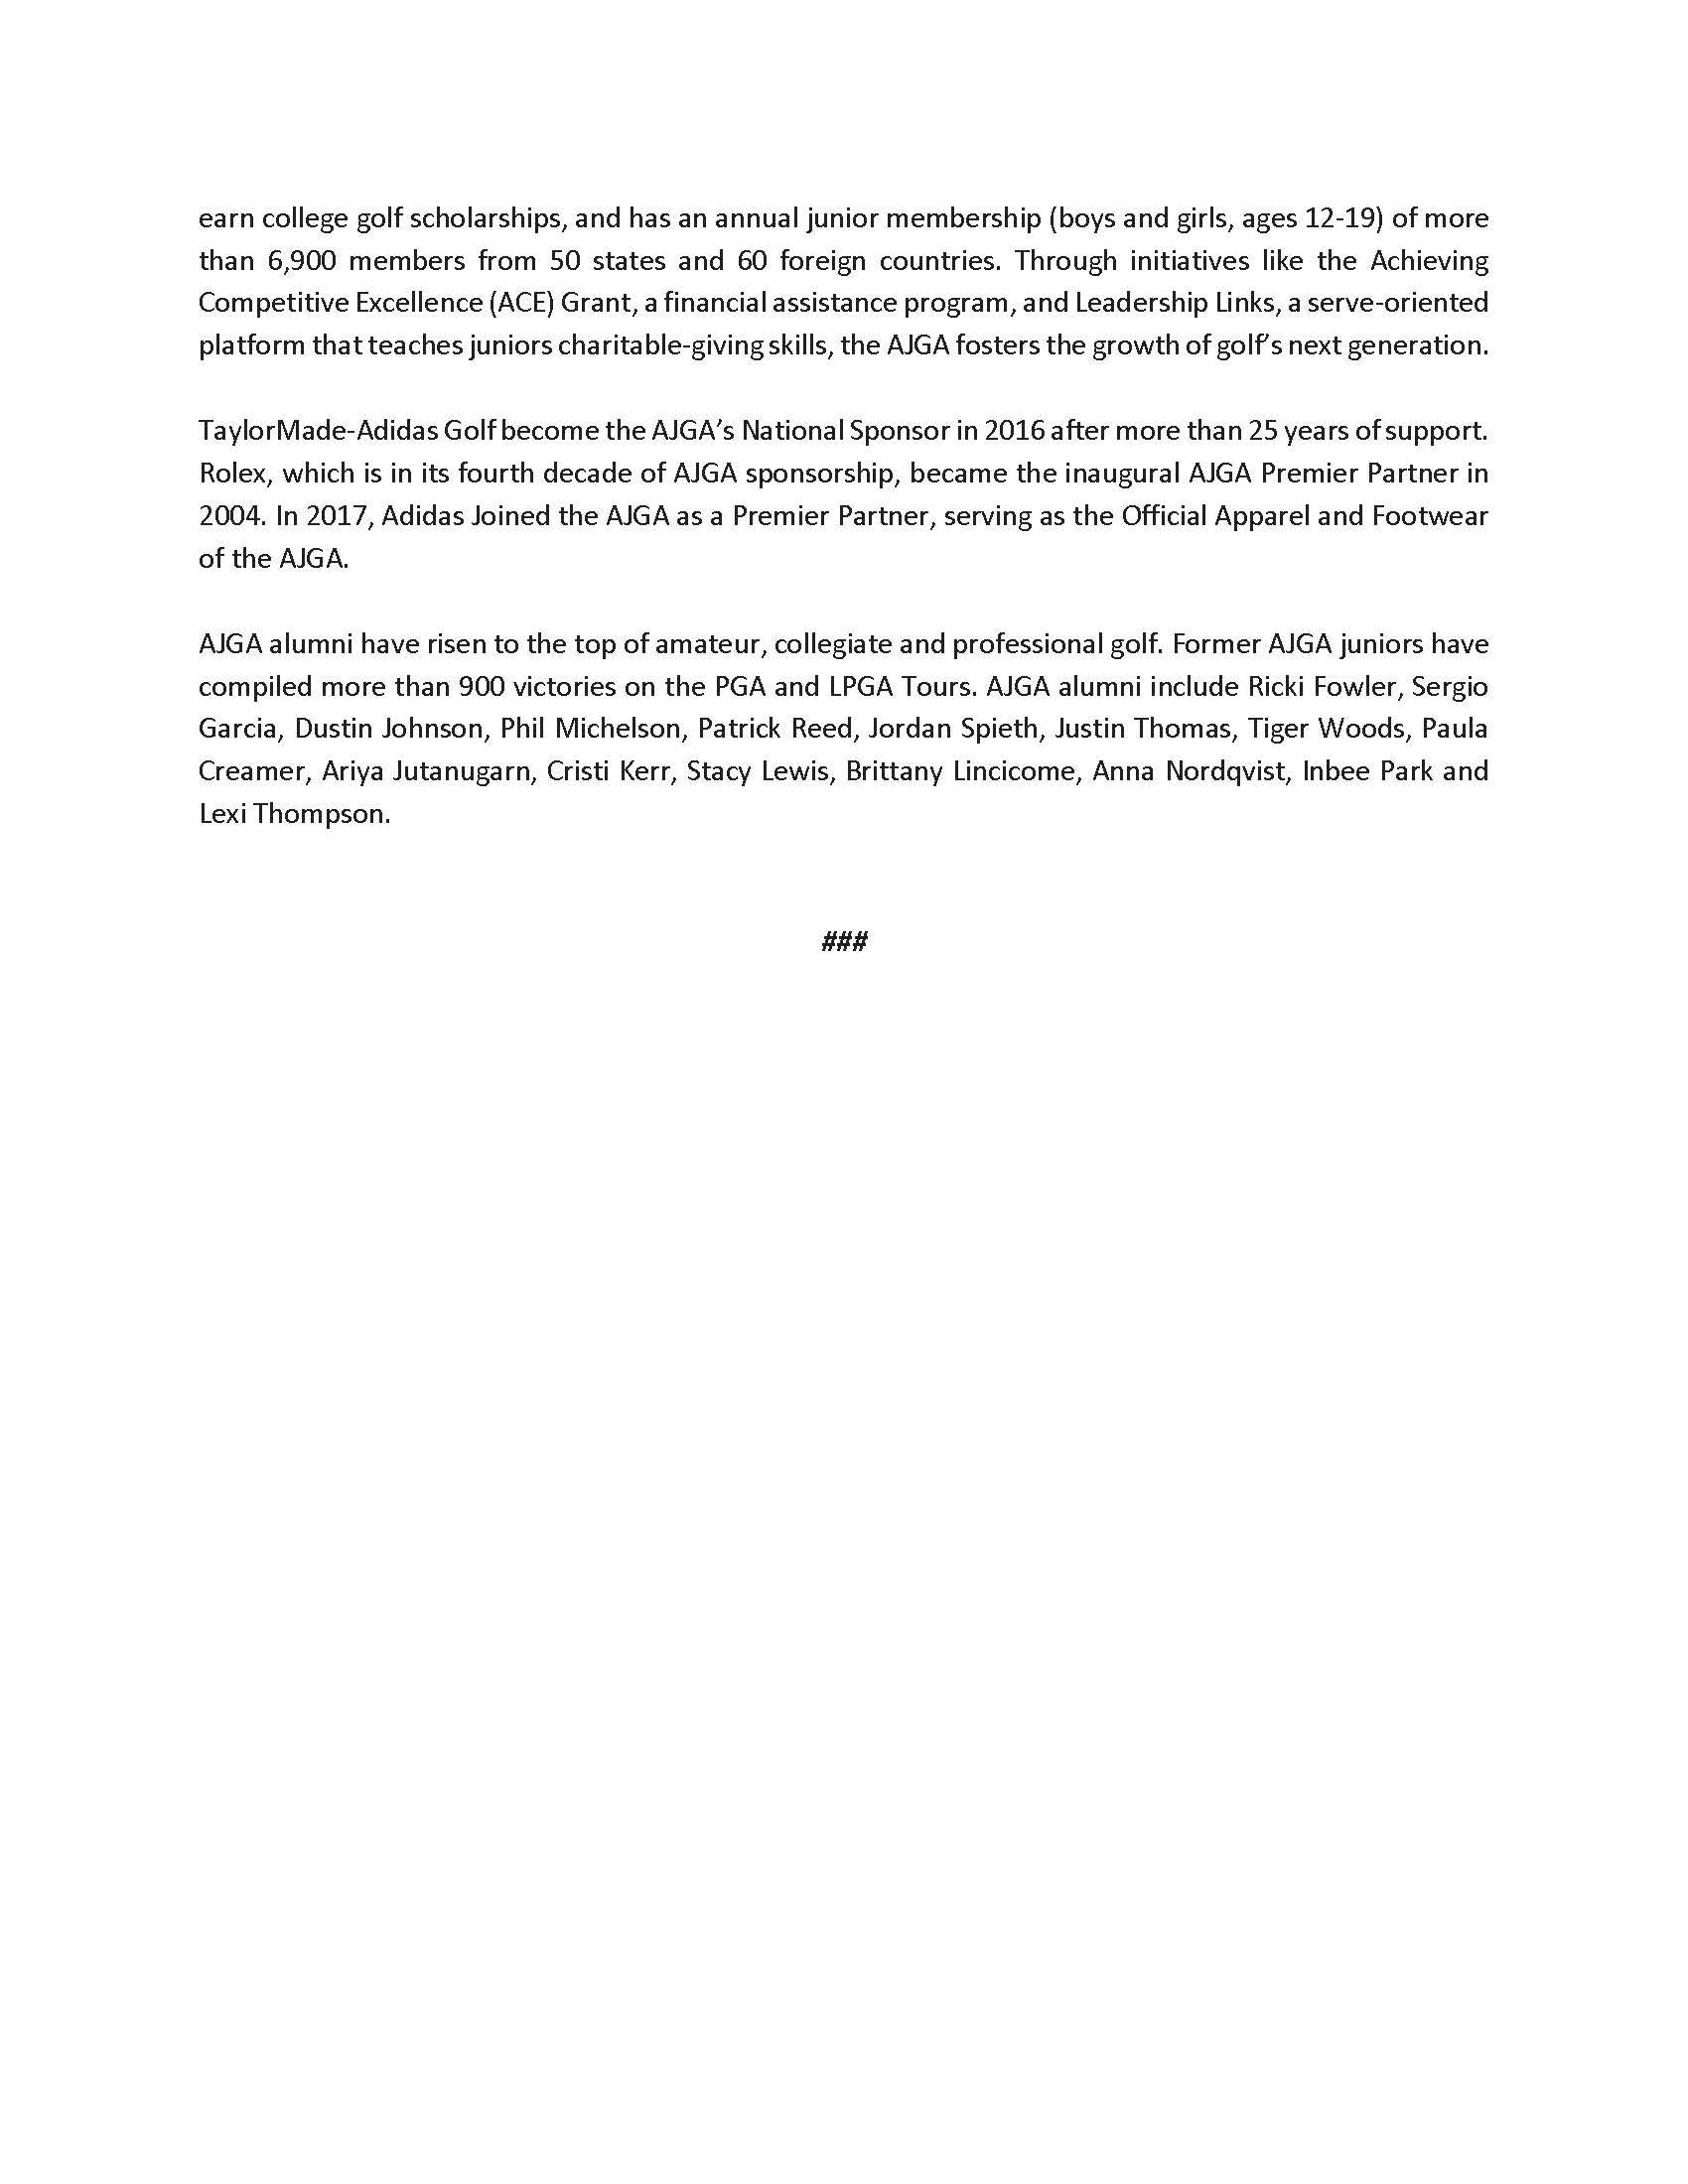 Junior Championship Release_v3FINAL (JUN 2018)_Page_3.jpg